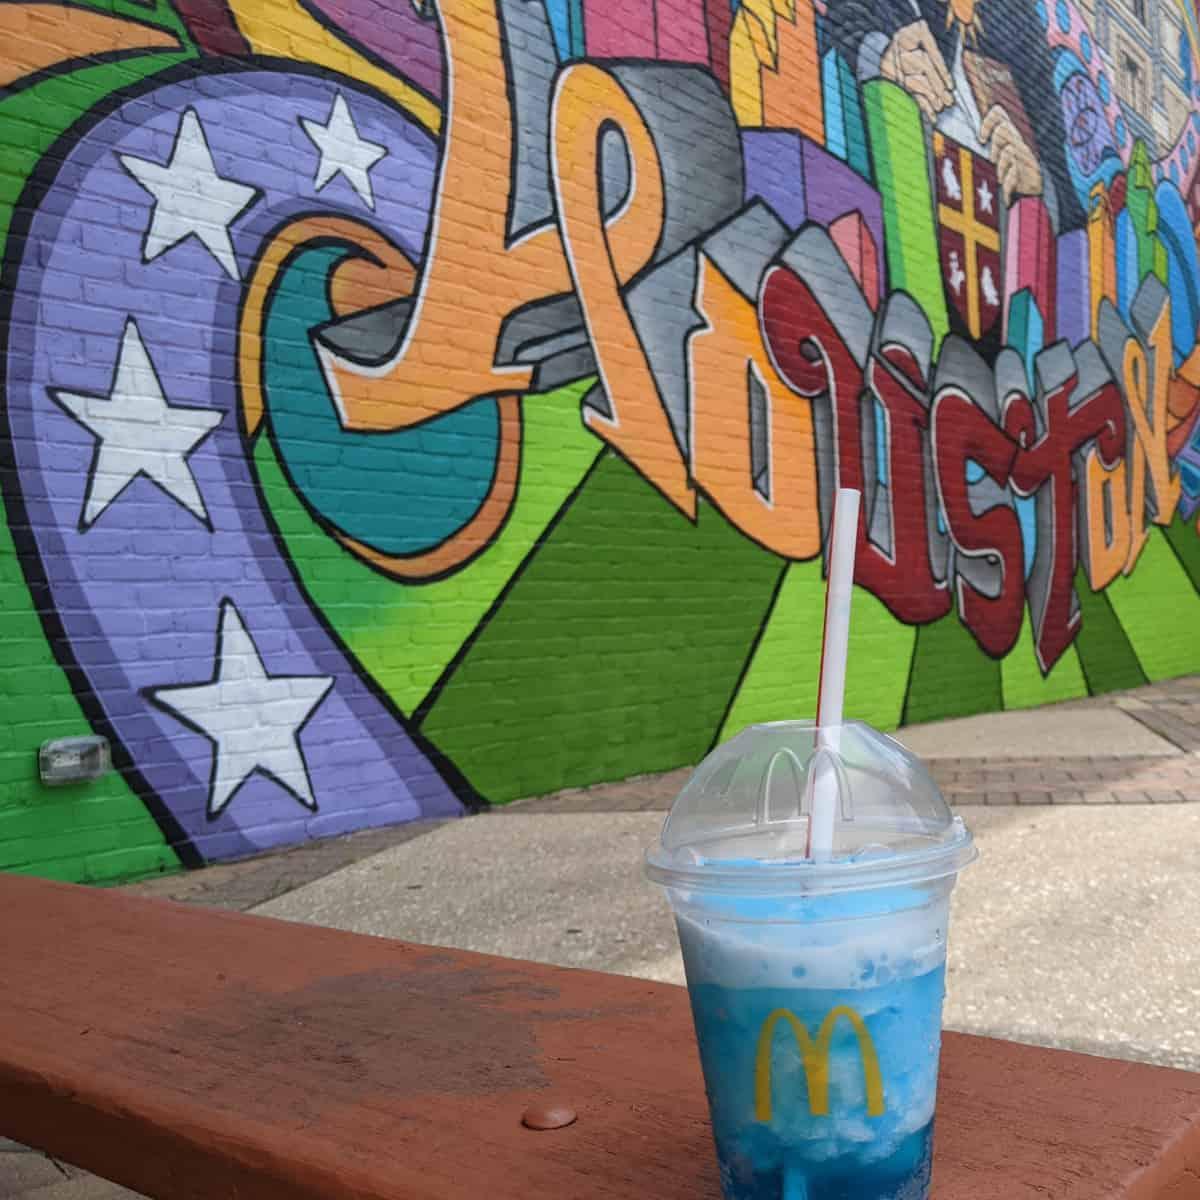 McDonalds Frozen Fanta at Houston Mural